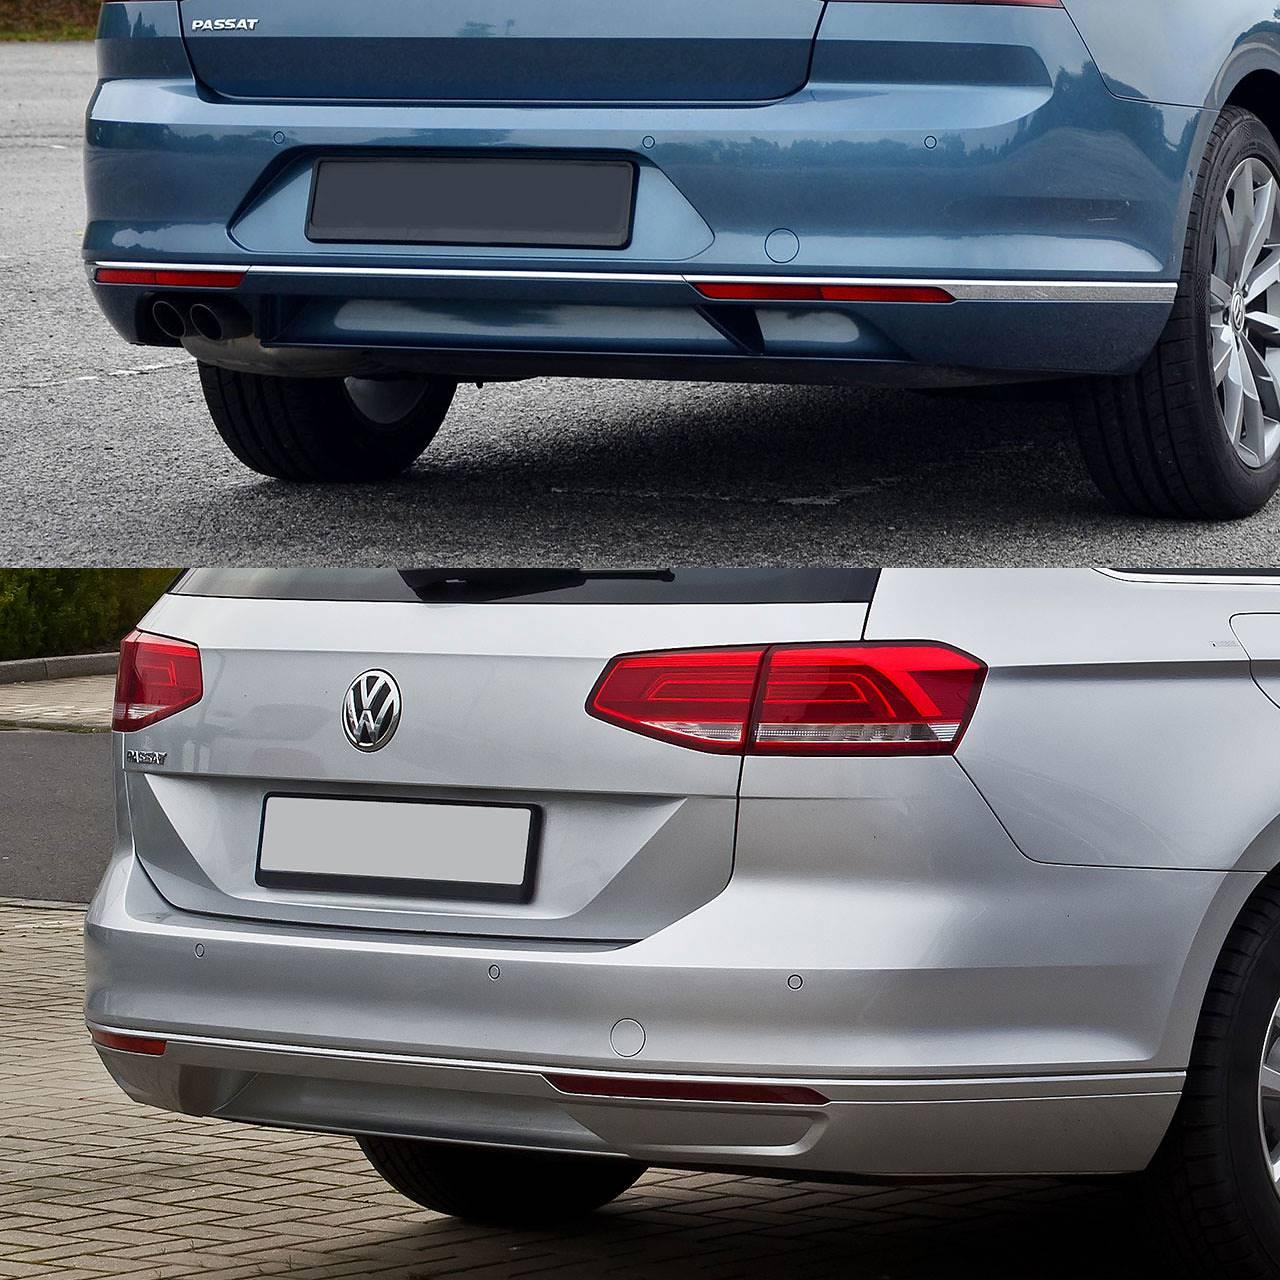 Performance sport exhaust for VW PASSAT B8 2 0 TDI, VW